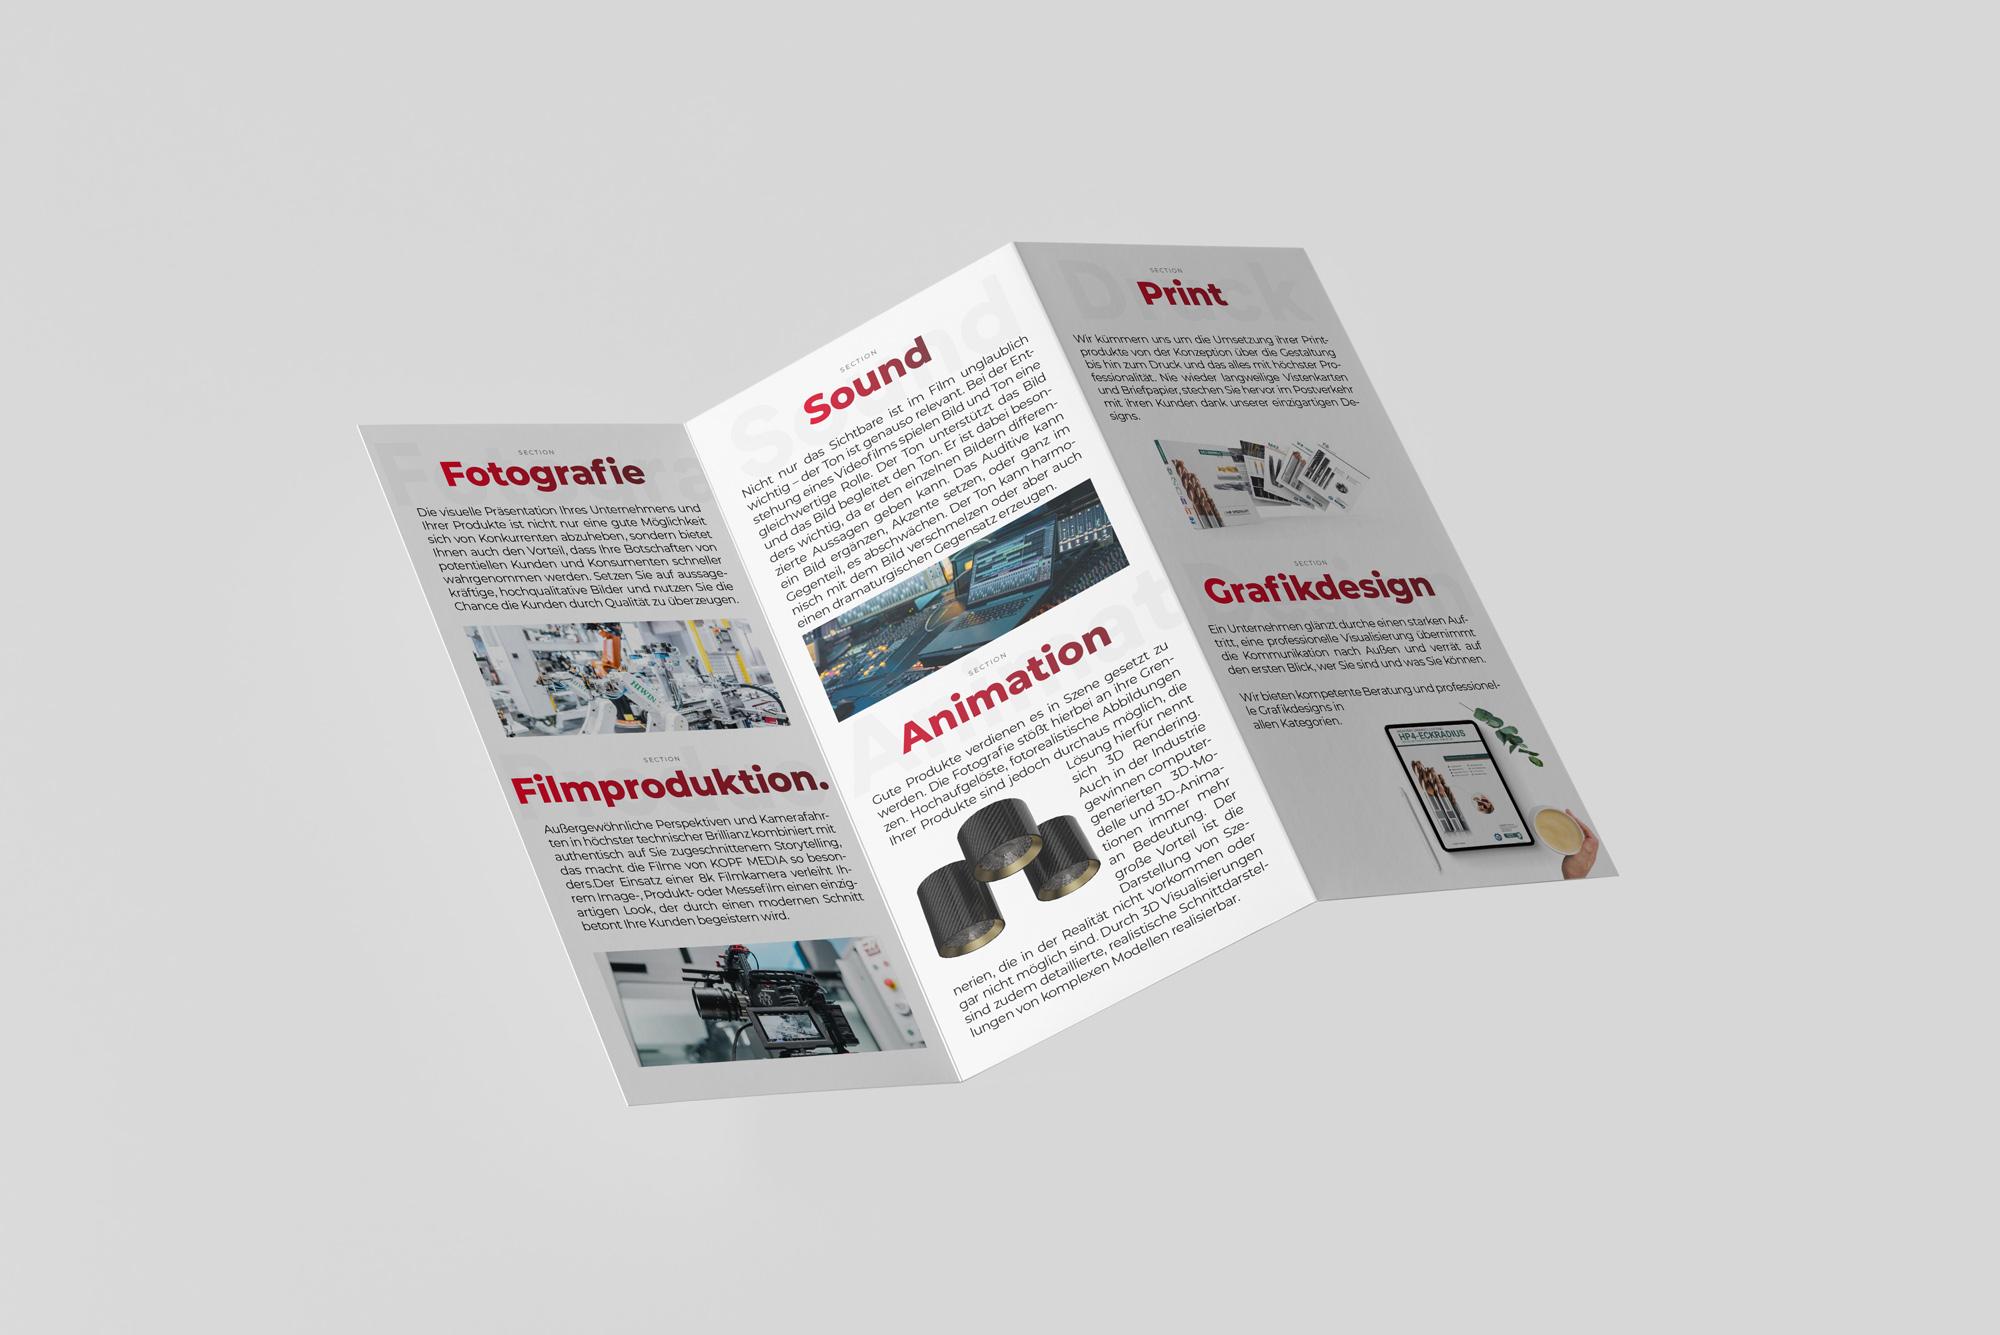 kopfmedia flyer printmedien grafikdesign